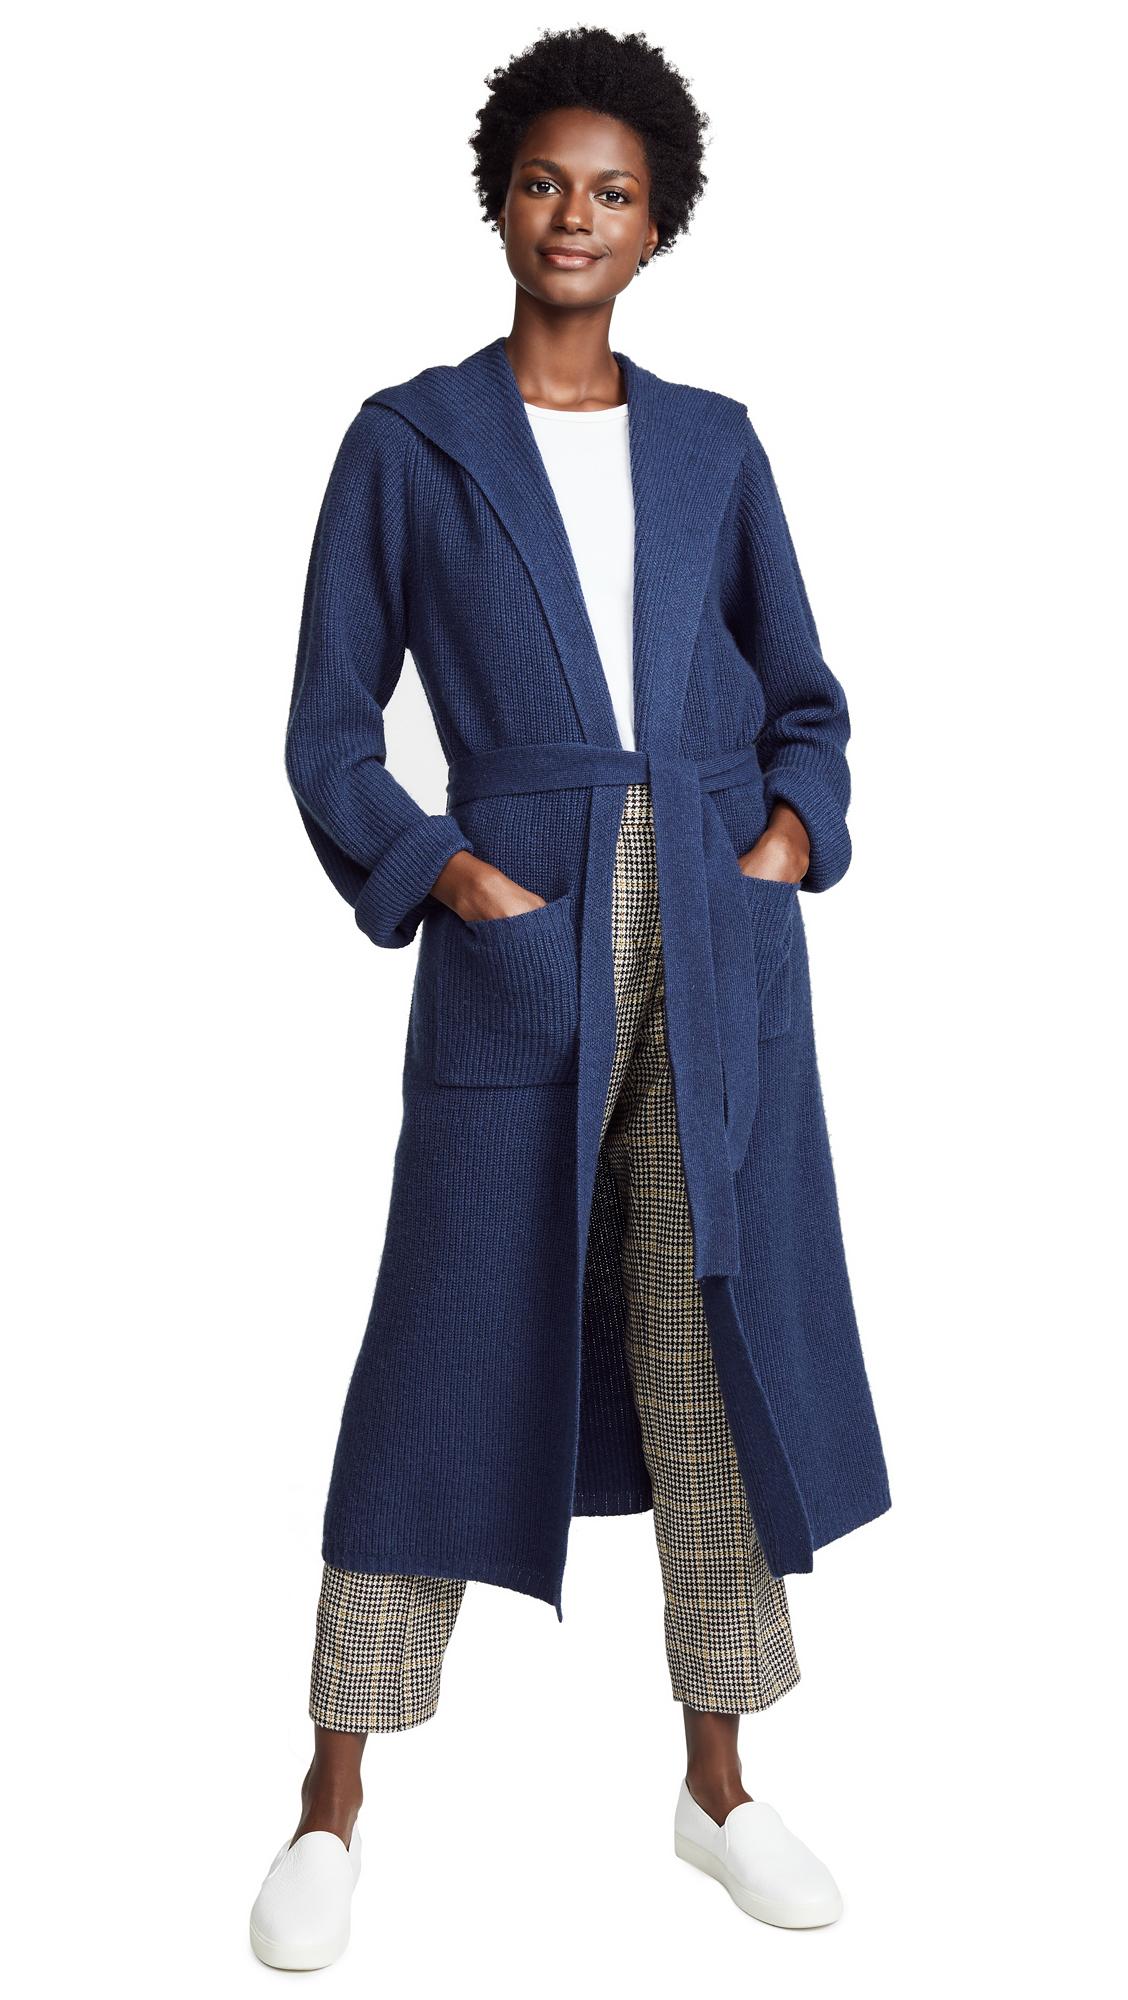 JENNY PARK Lida Hooded Maxi Cardigan In Indigo